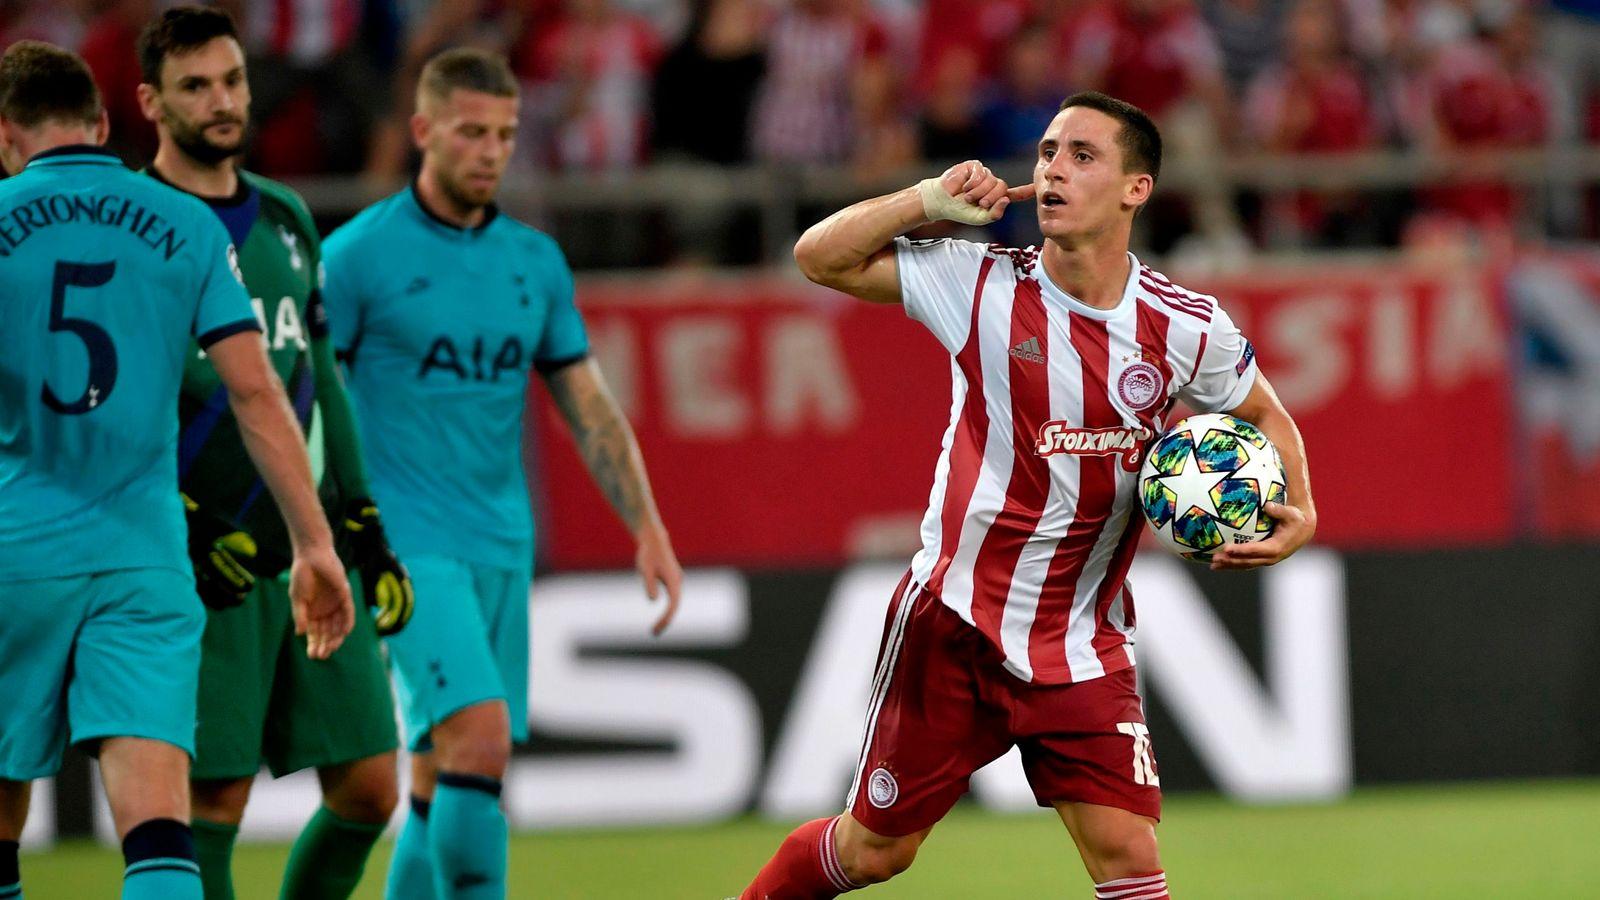 Olympiakos 2-2 Tottenham: Spurs throw away two-goal lead in Greece